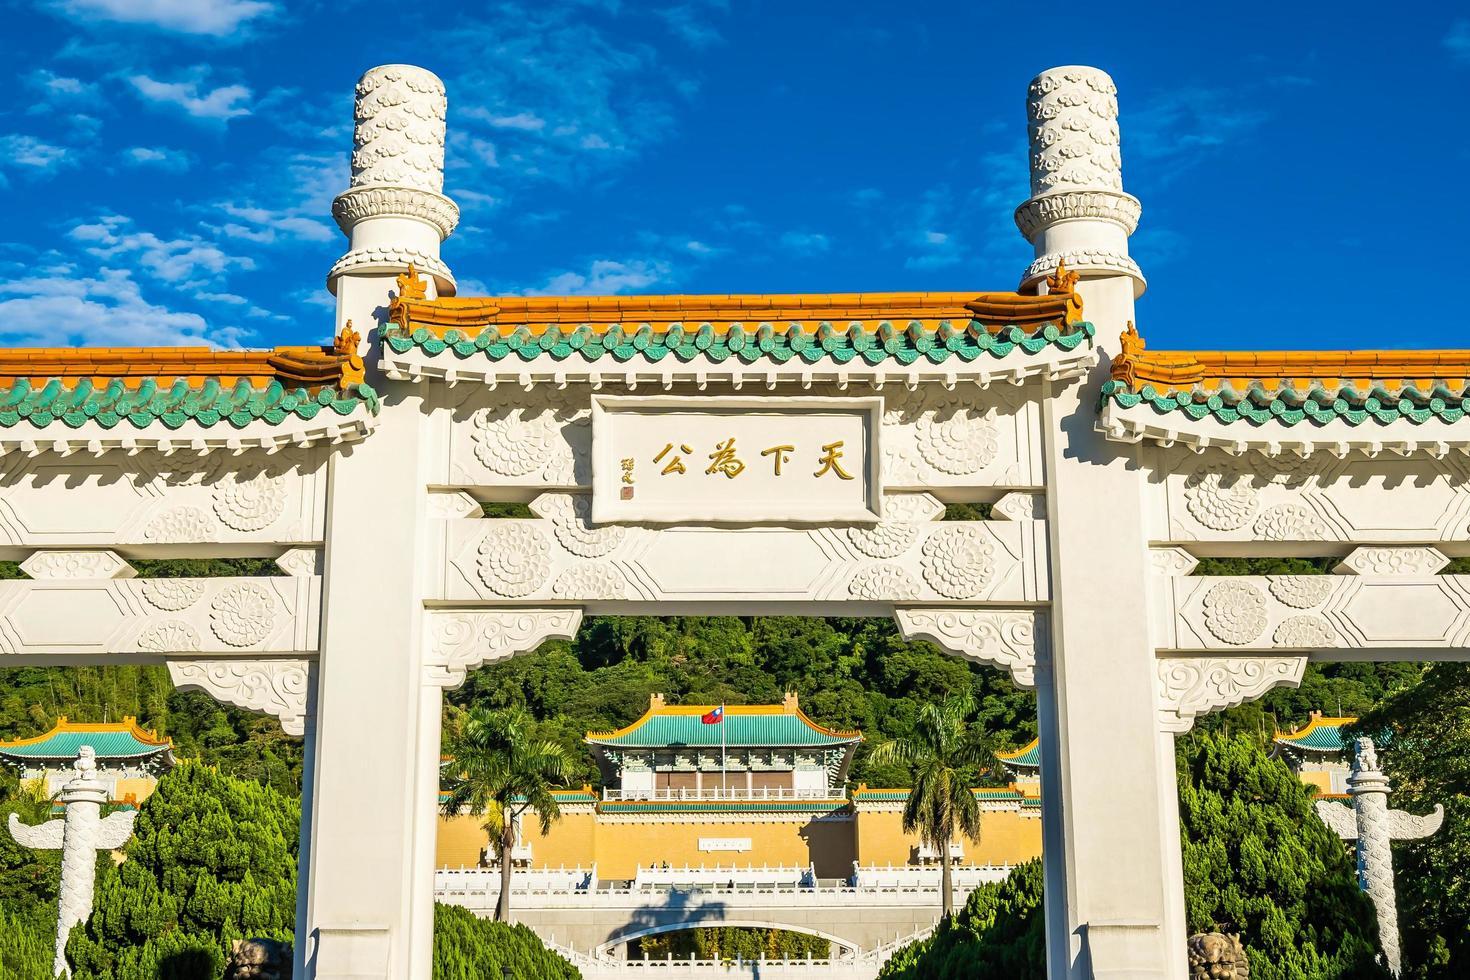 Gate at the Taipei National Palace Museum in Taipei City, Taiwan photo